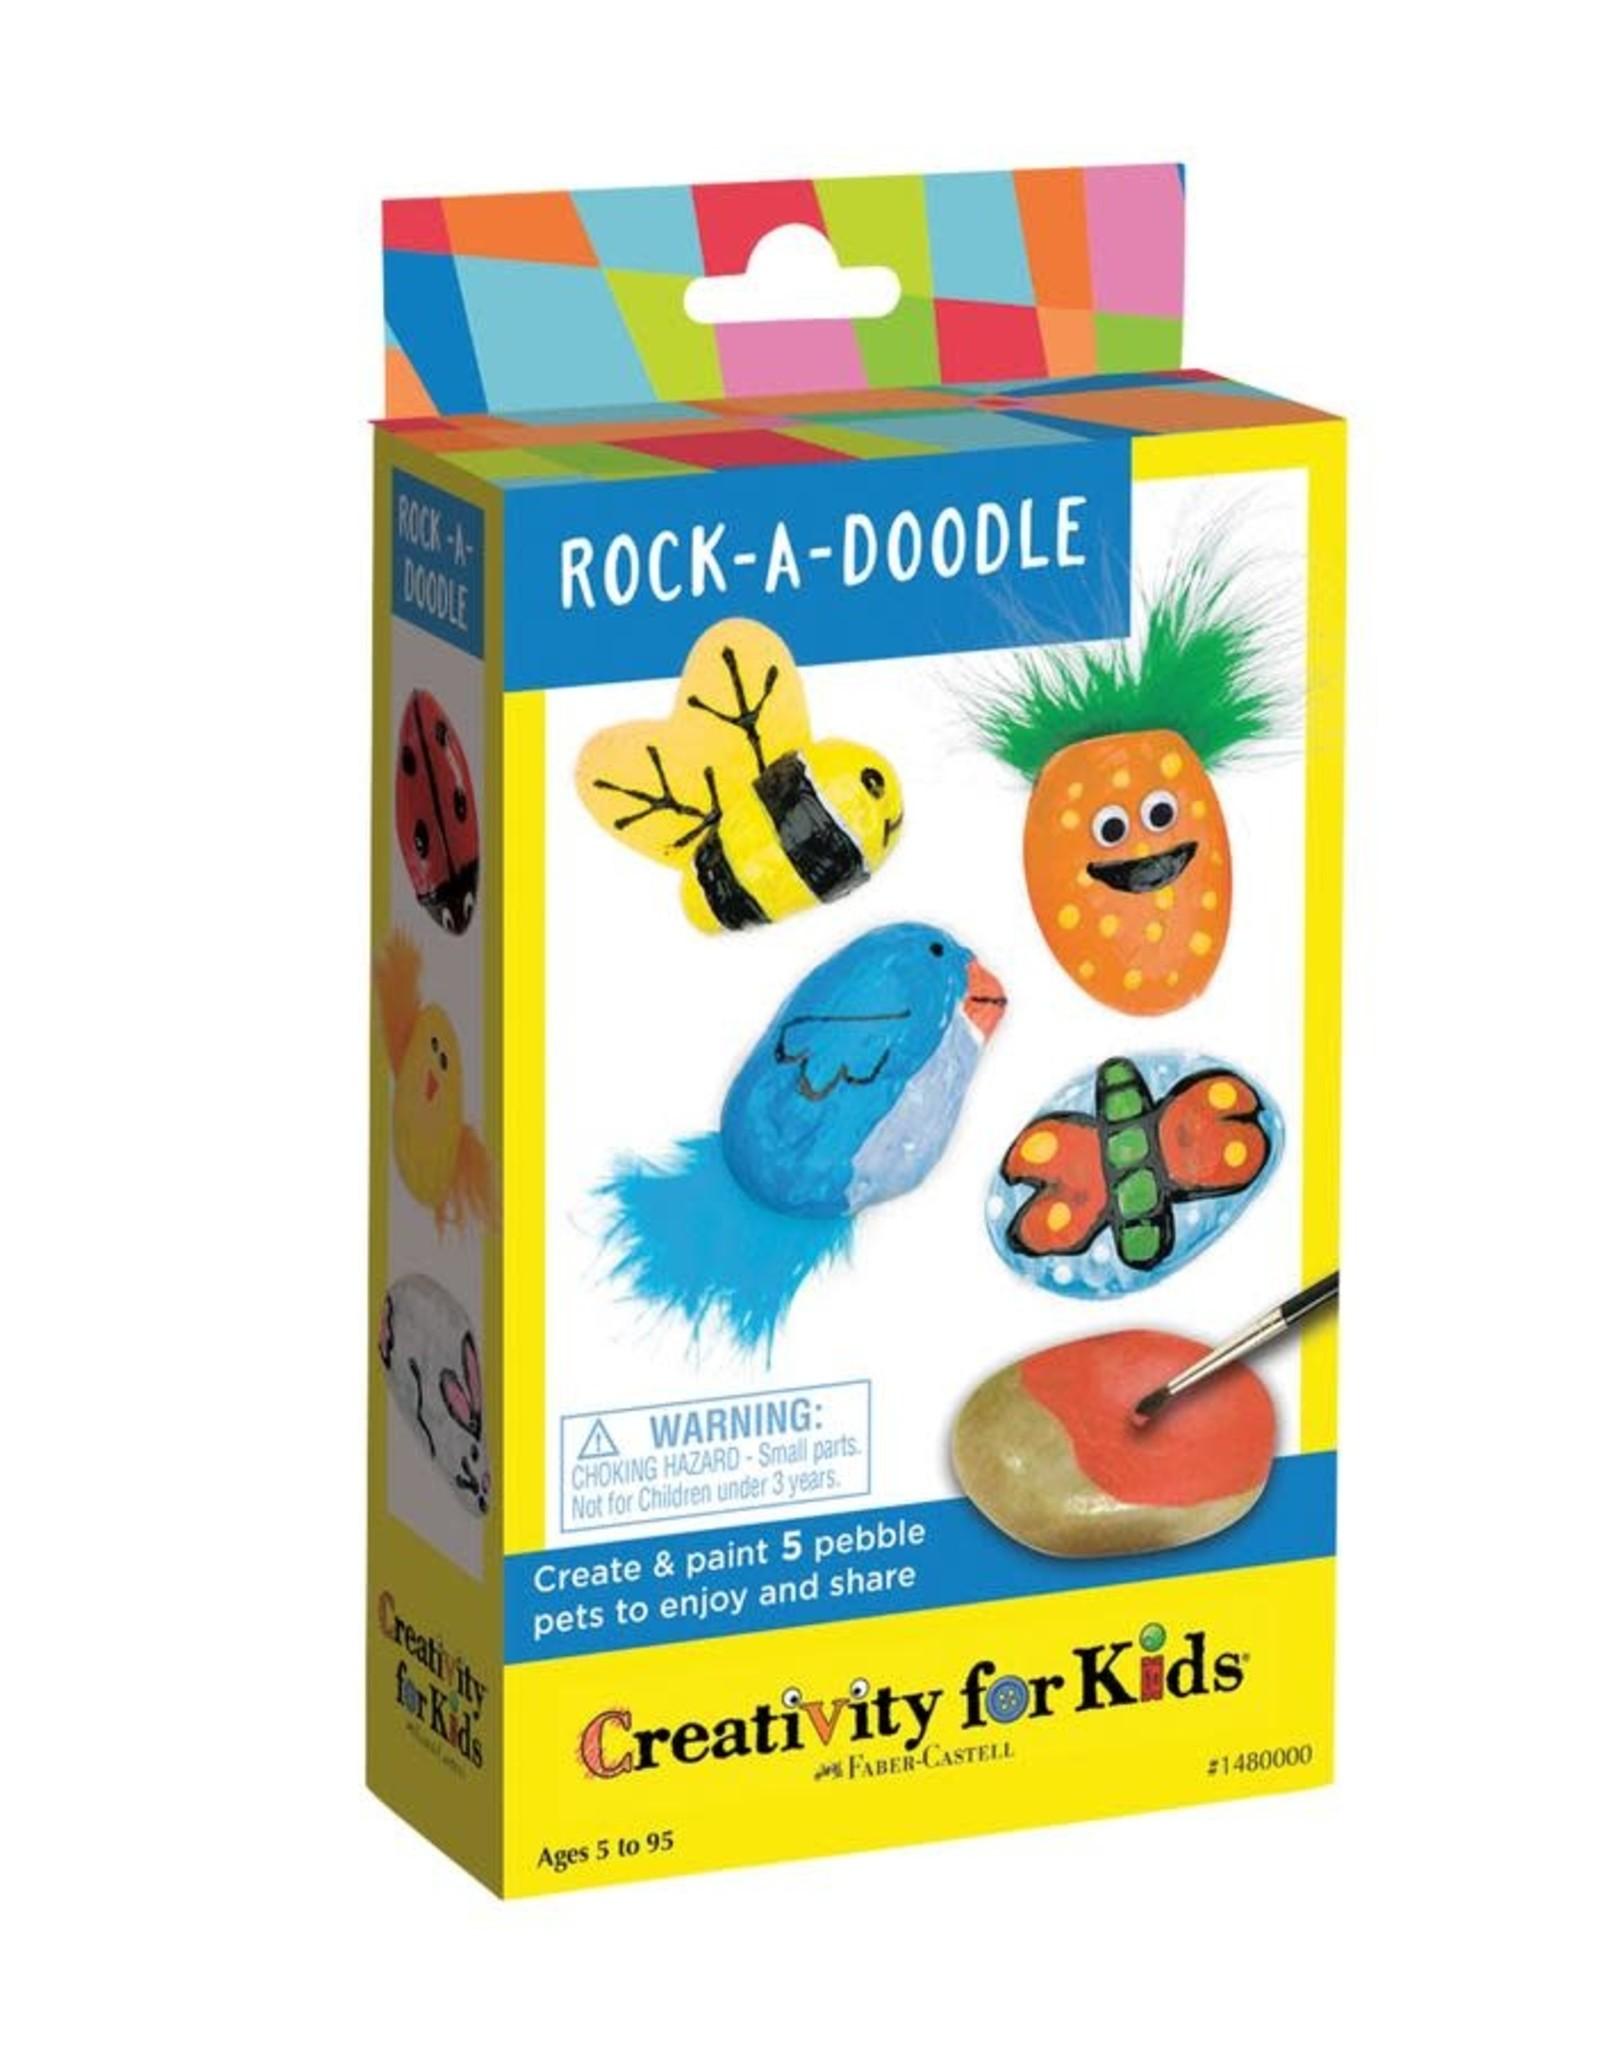 Creativity For Kids Rock-A-Doodle Mini Kit